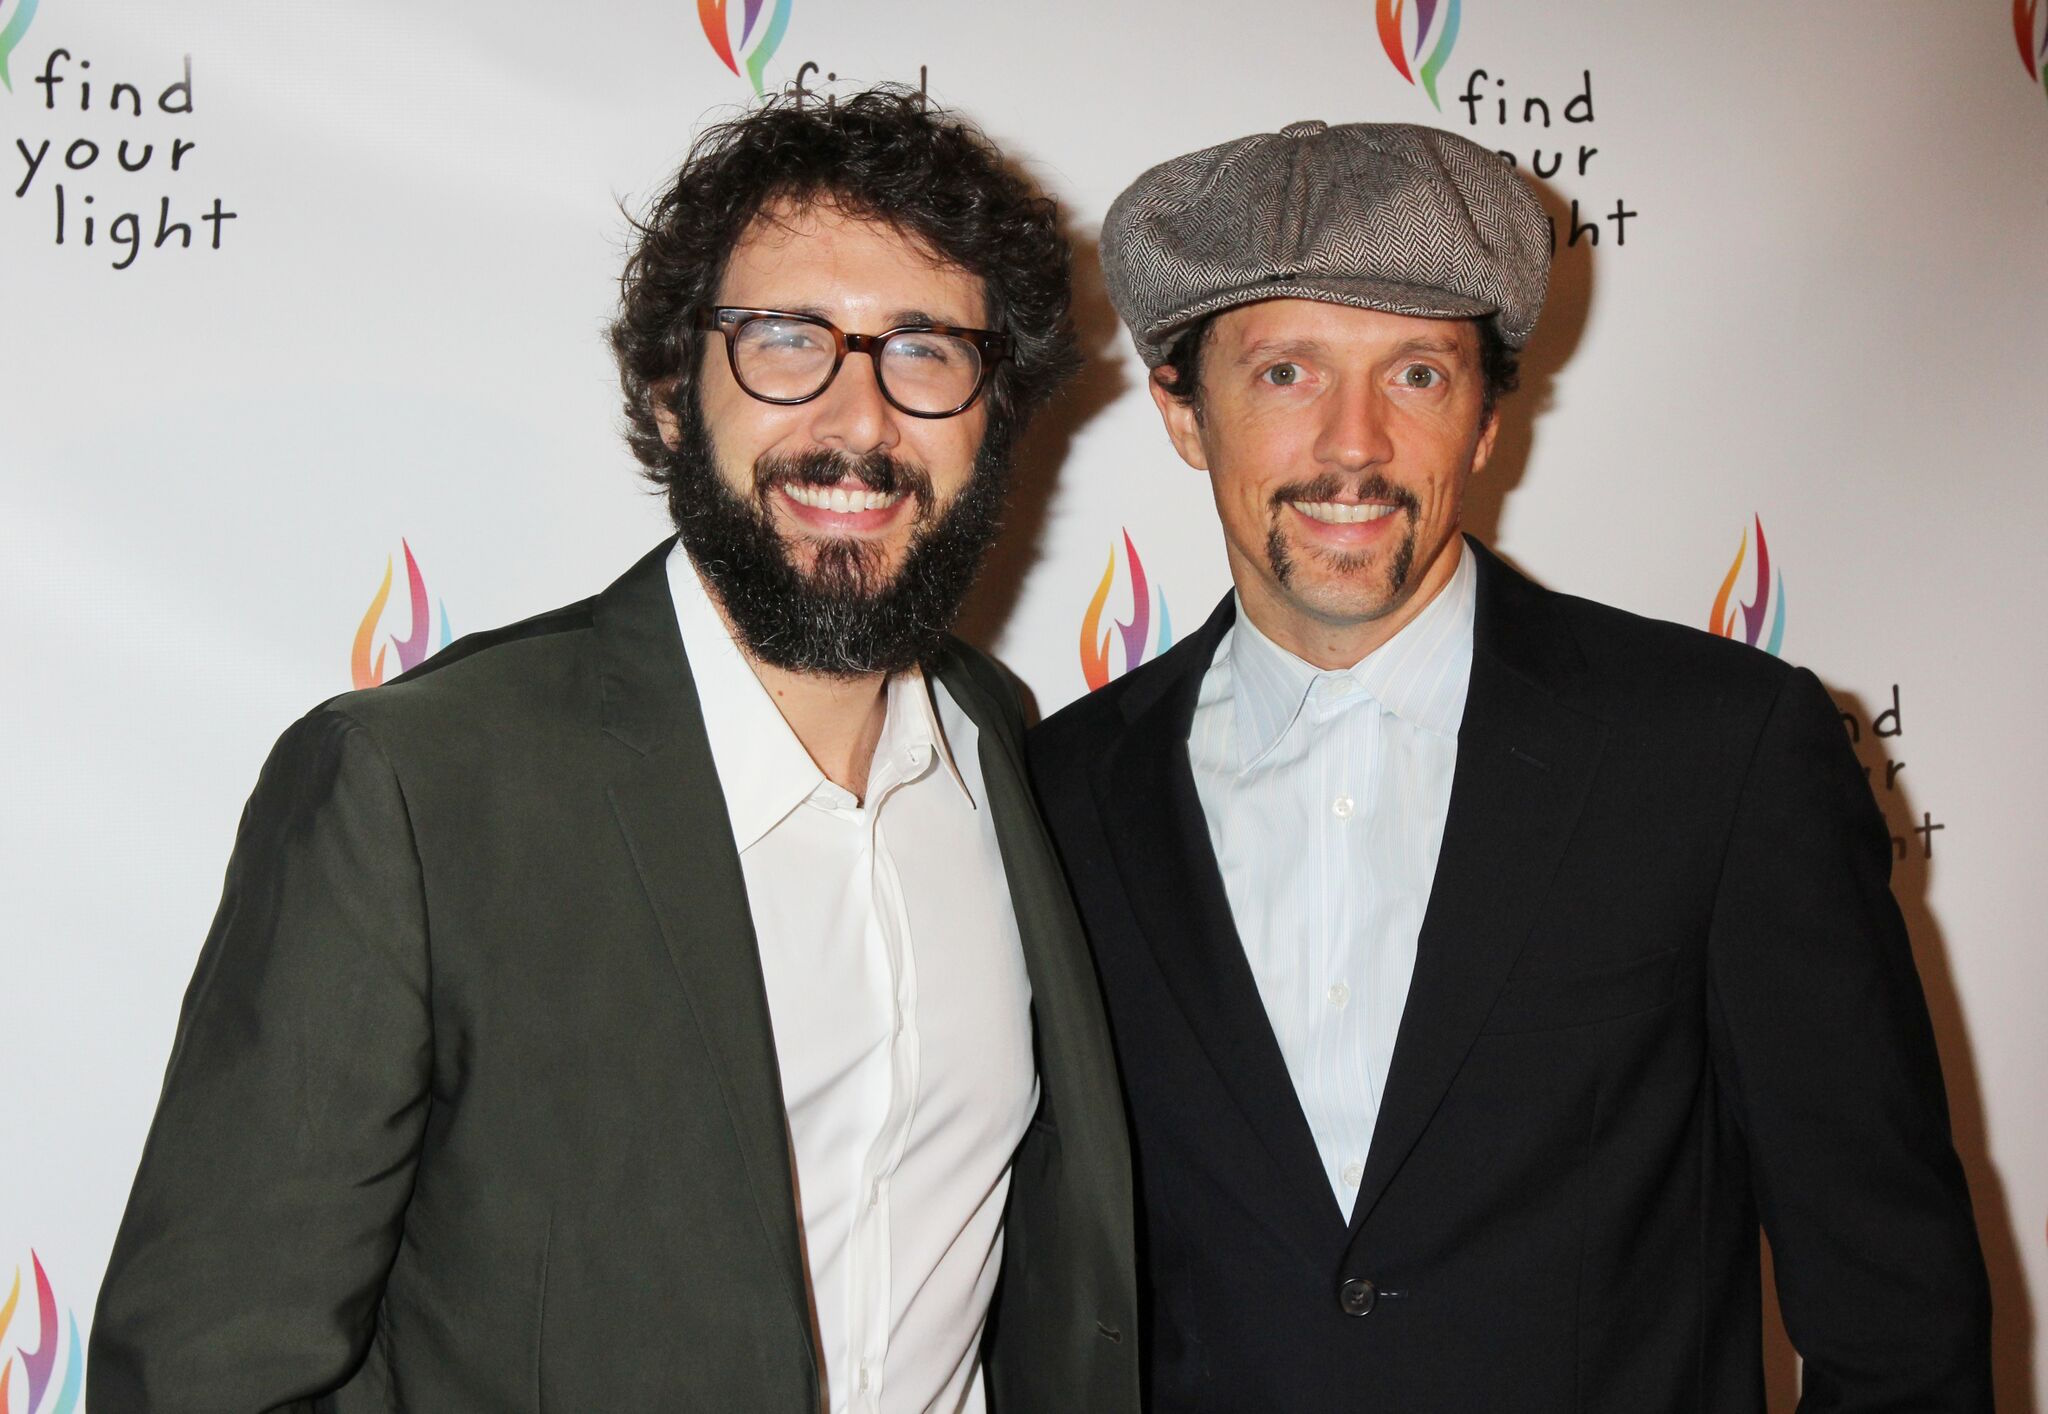 Josh Groban and Jason Mraz at last year's event